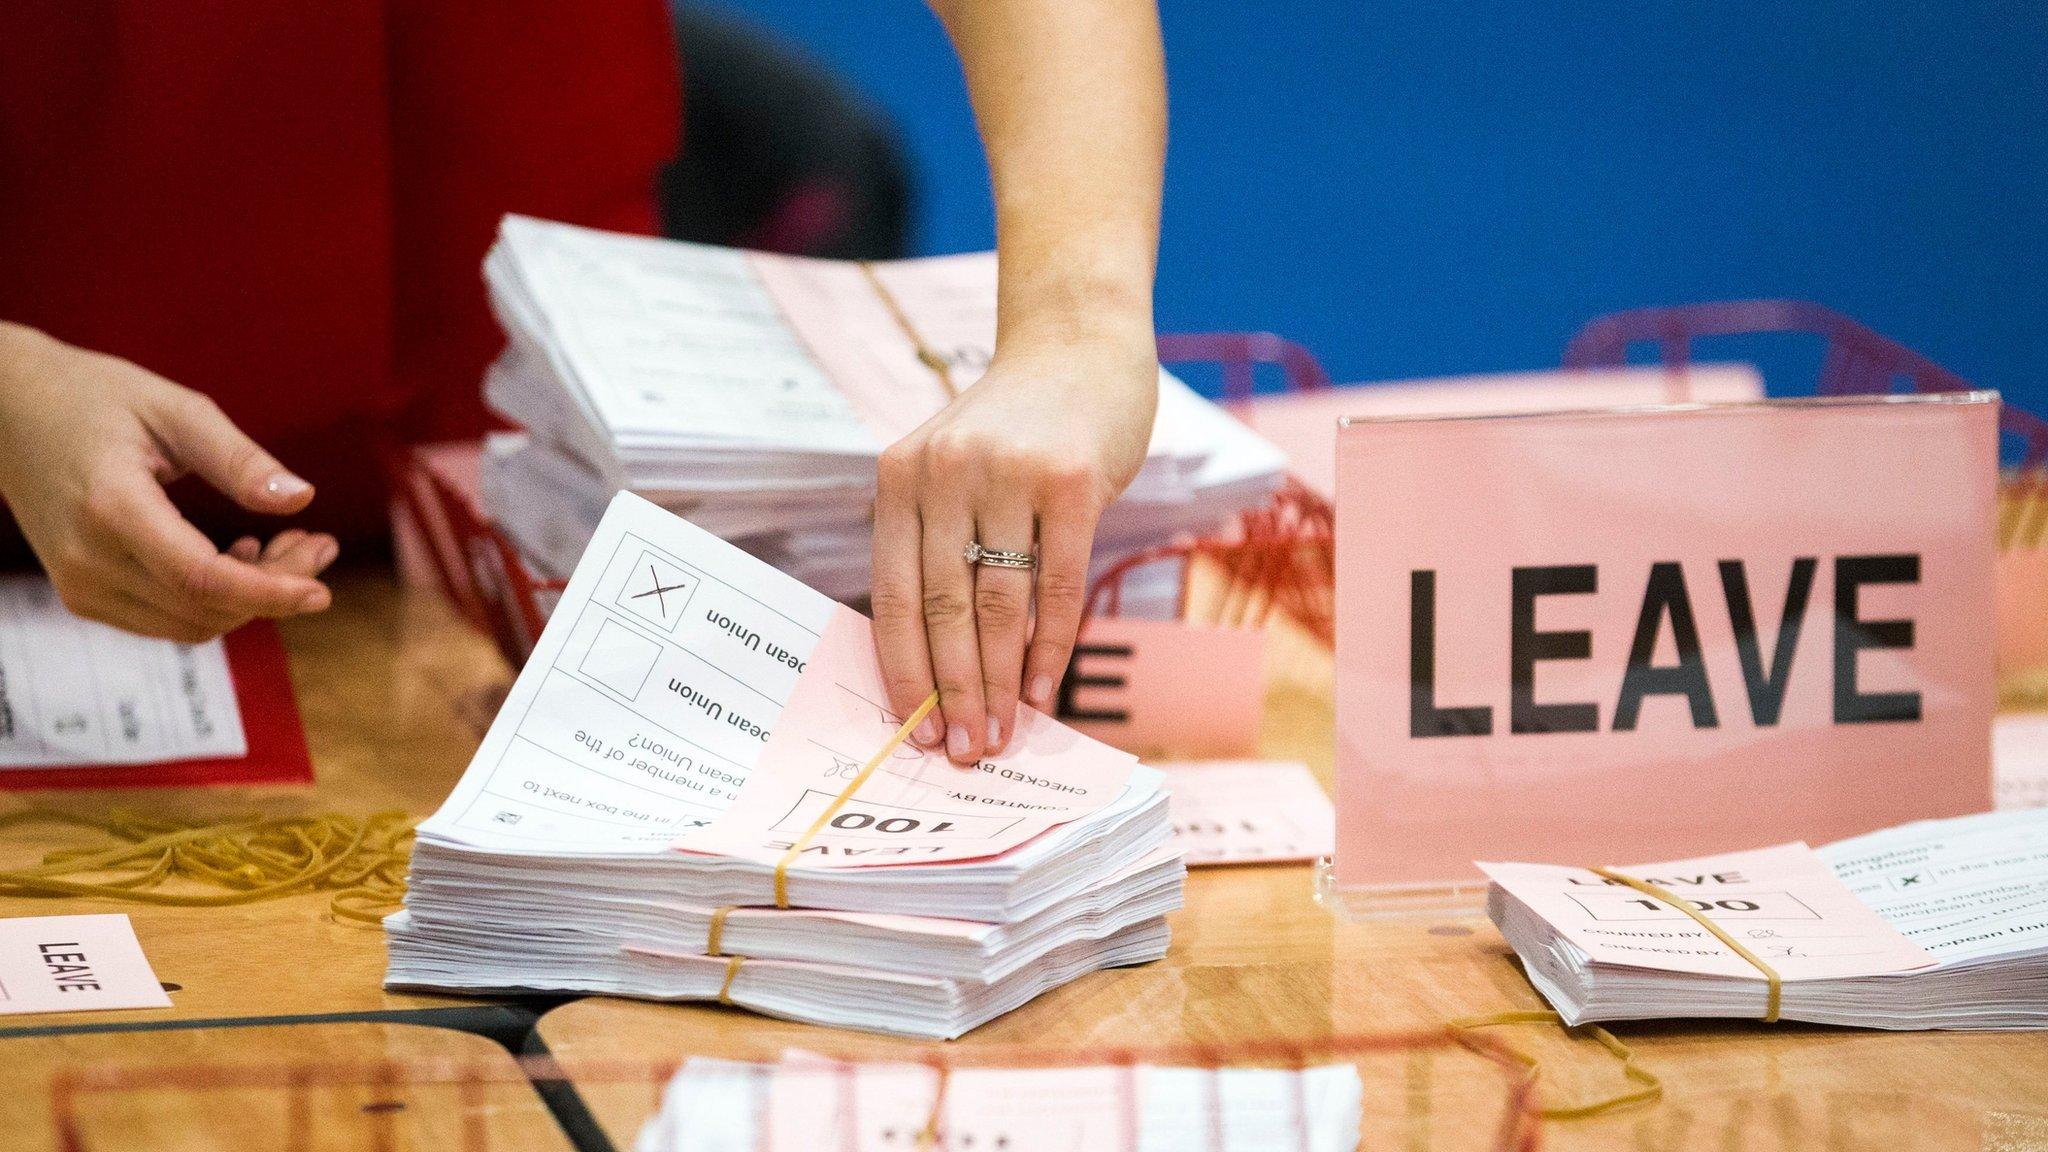 Brexit: UK votes to leave EU in historic referendum